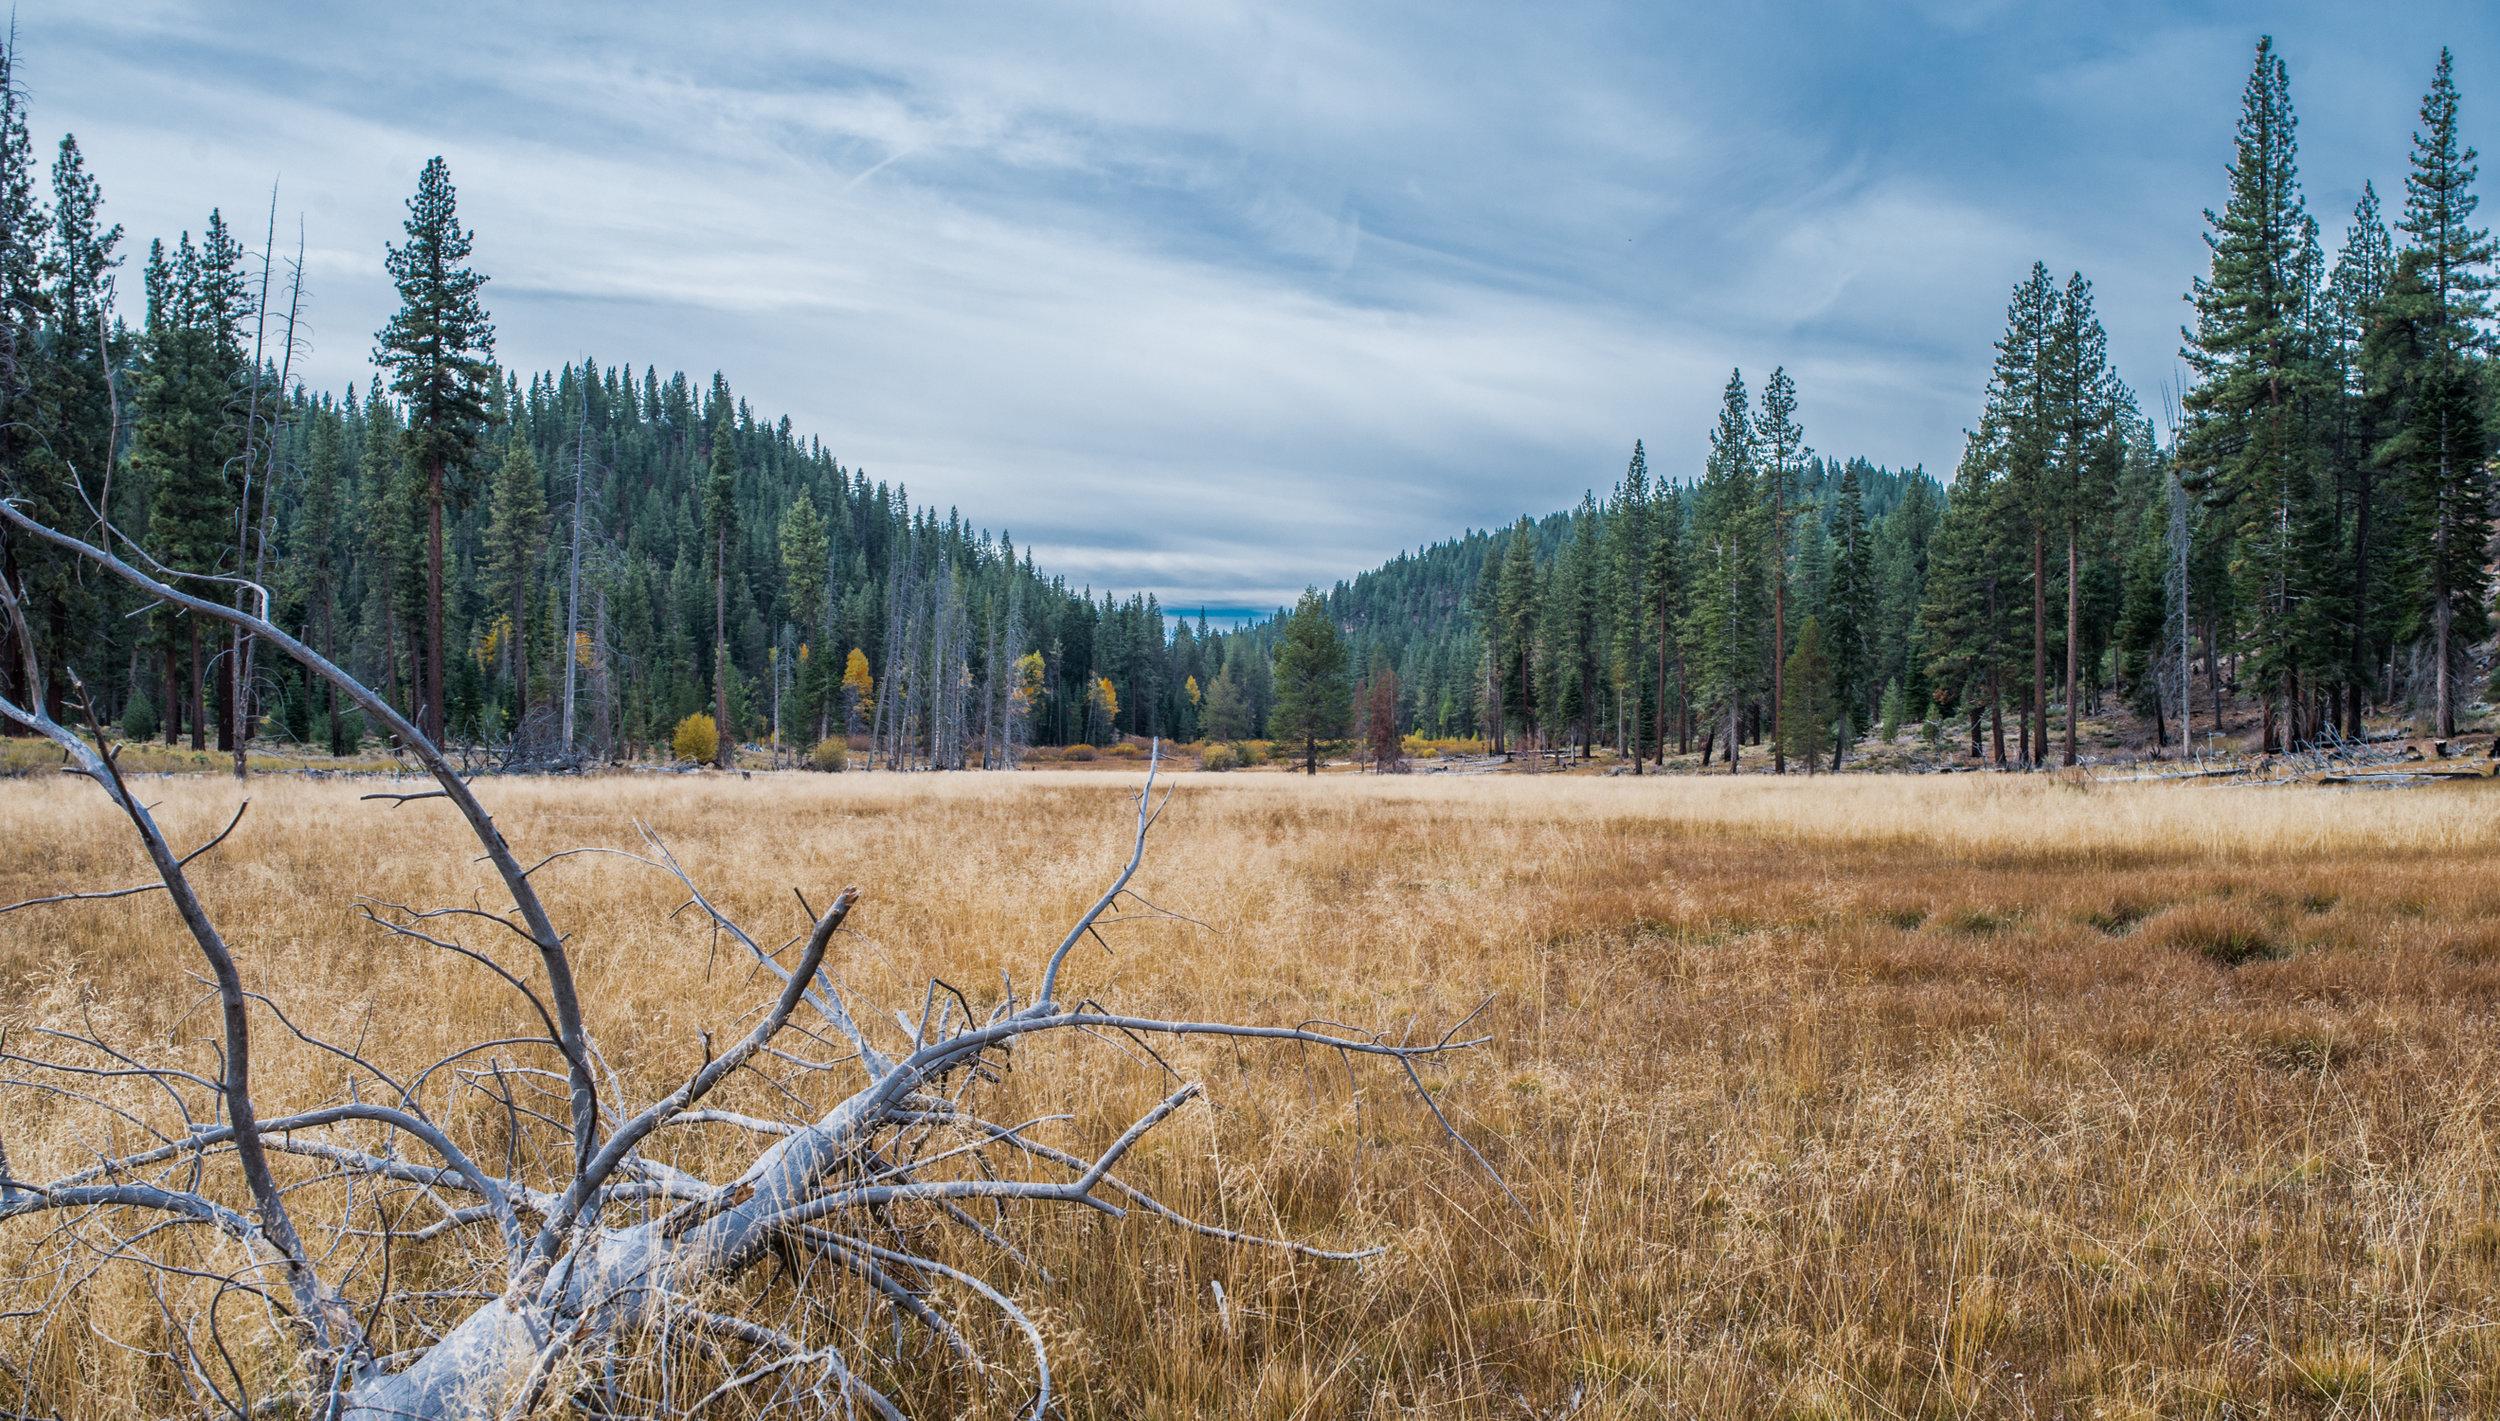 Skunk Harbor Fall Meadow, Washoe Co. NV (Oct 16, 2014)